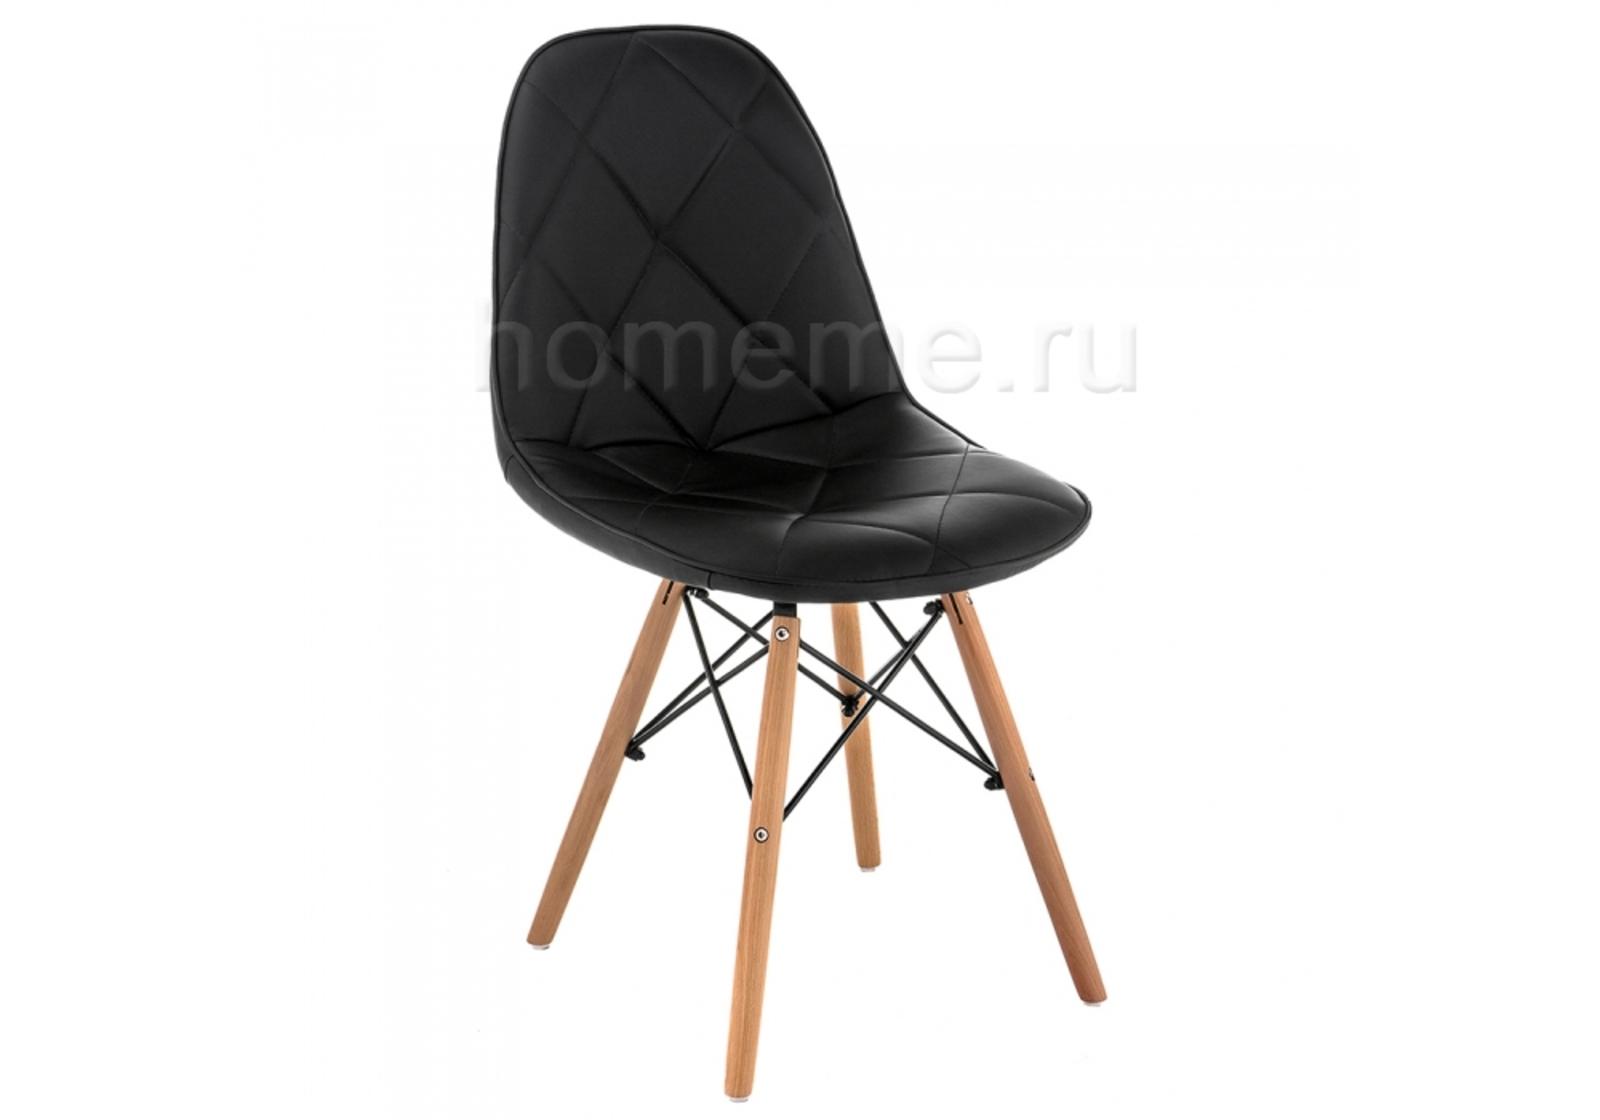 Стул деревянный Eames PC-147 черный 11198 Eames PC-147 черный 11198 (15887)